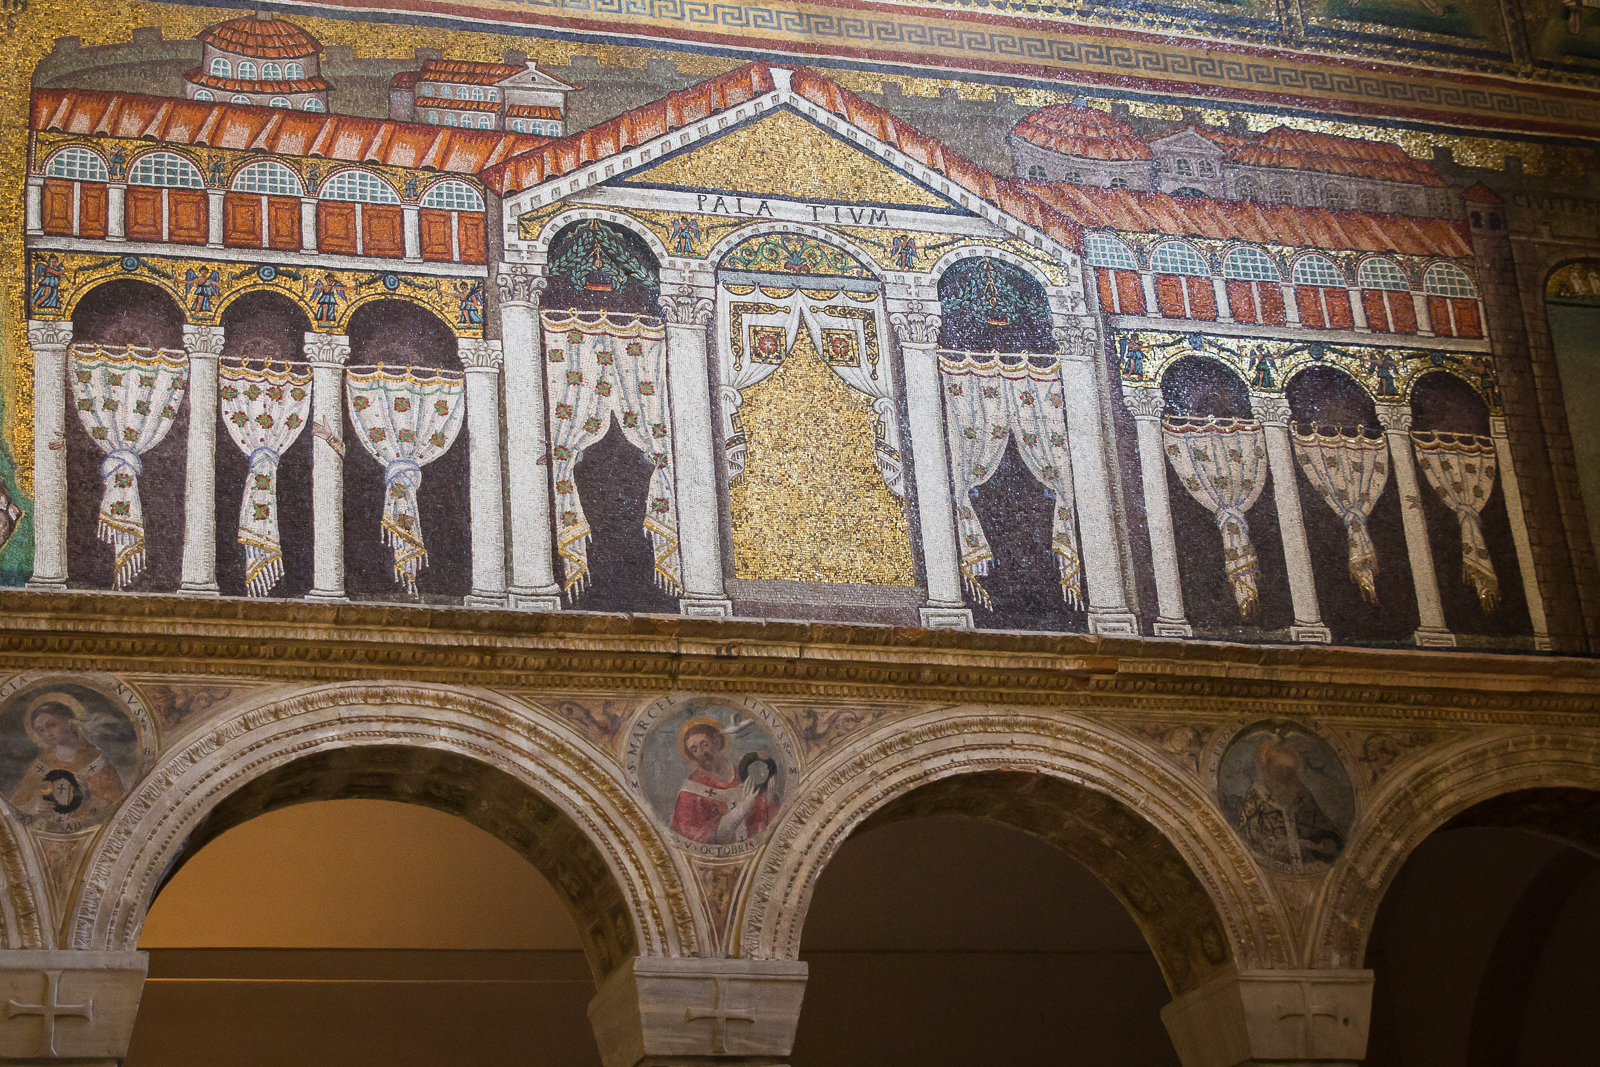 Theodoric's palace in Ravenna